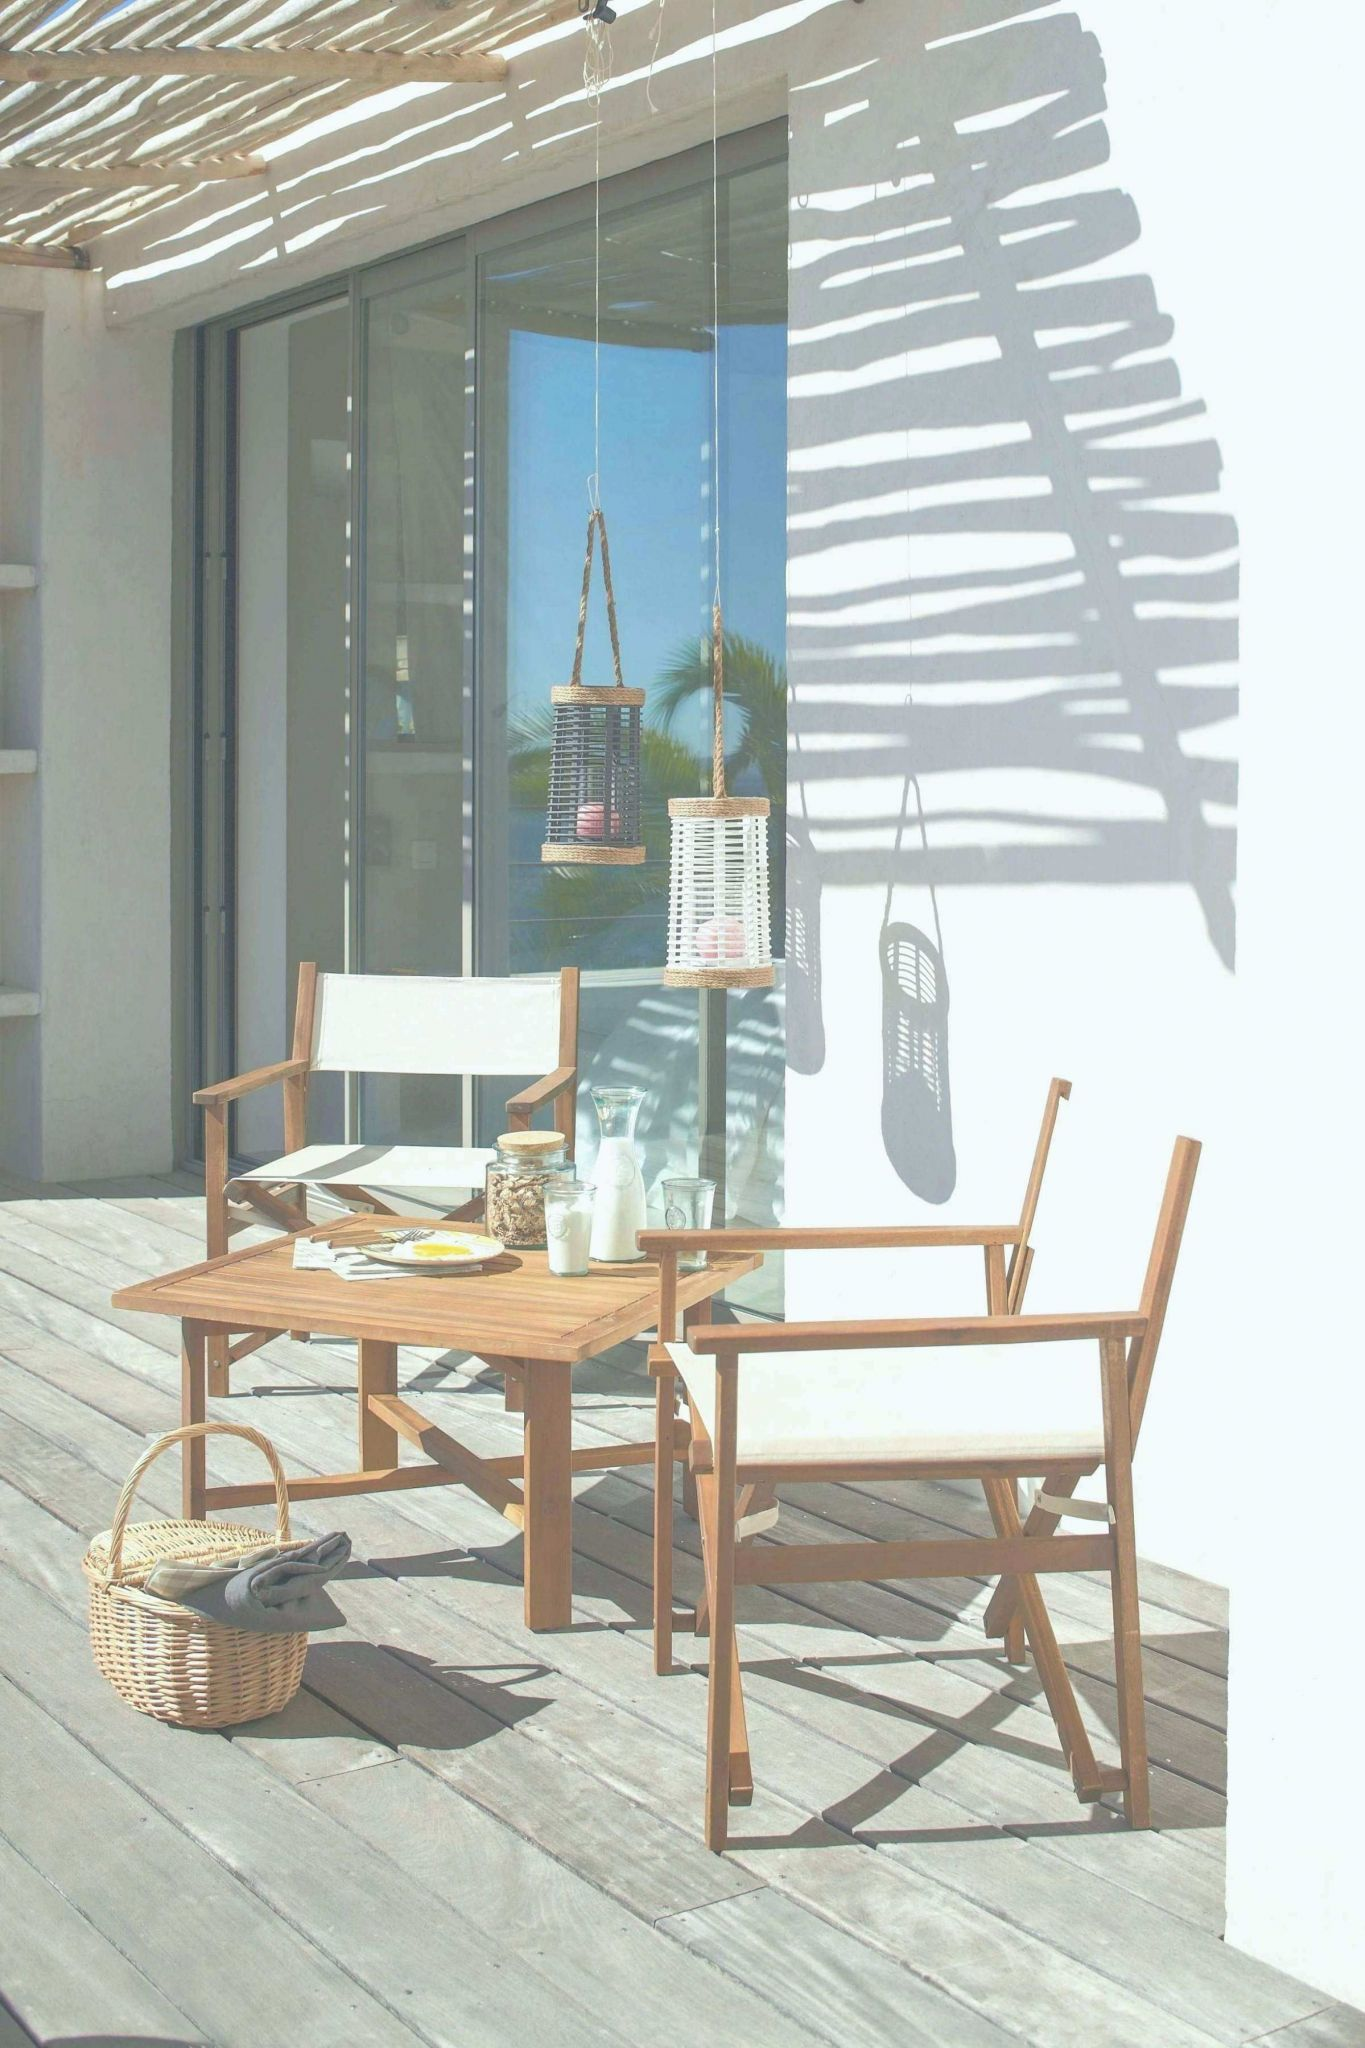 salon jardin bas aluminium ainsi que super jardin magnifique salon jardin super u frais chaise de jardin de salon jardin bas aluminium